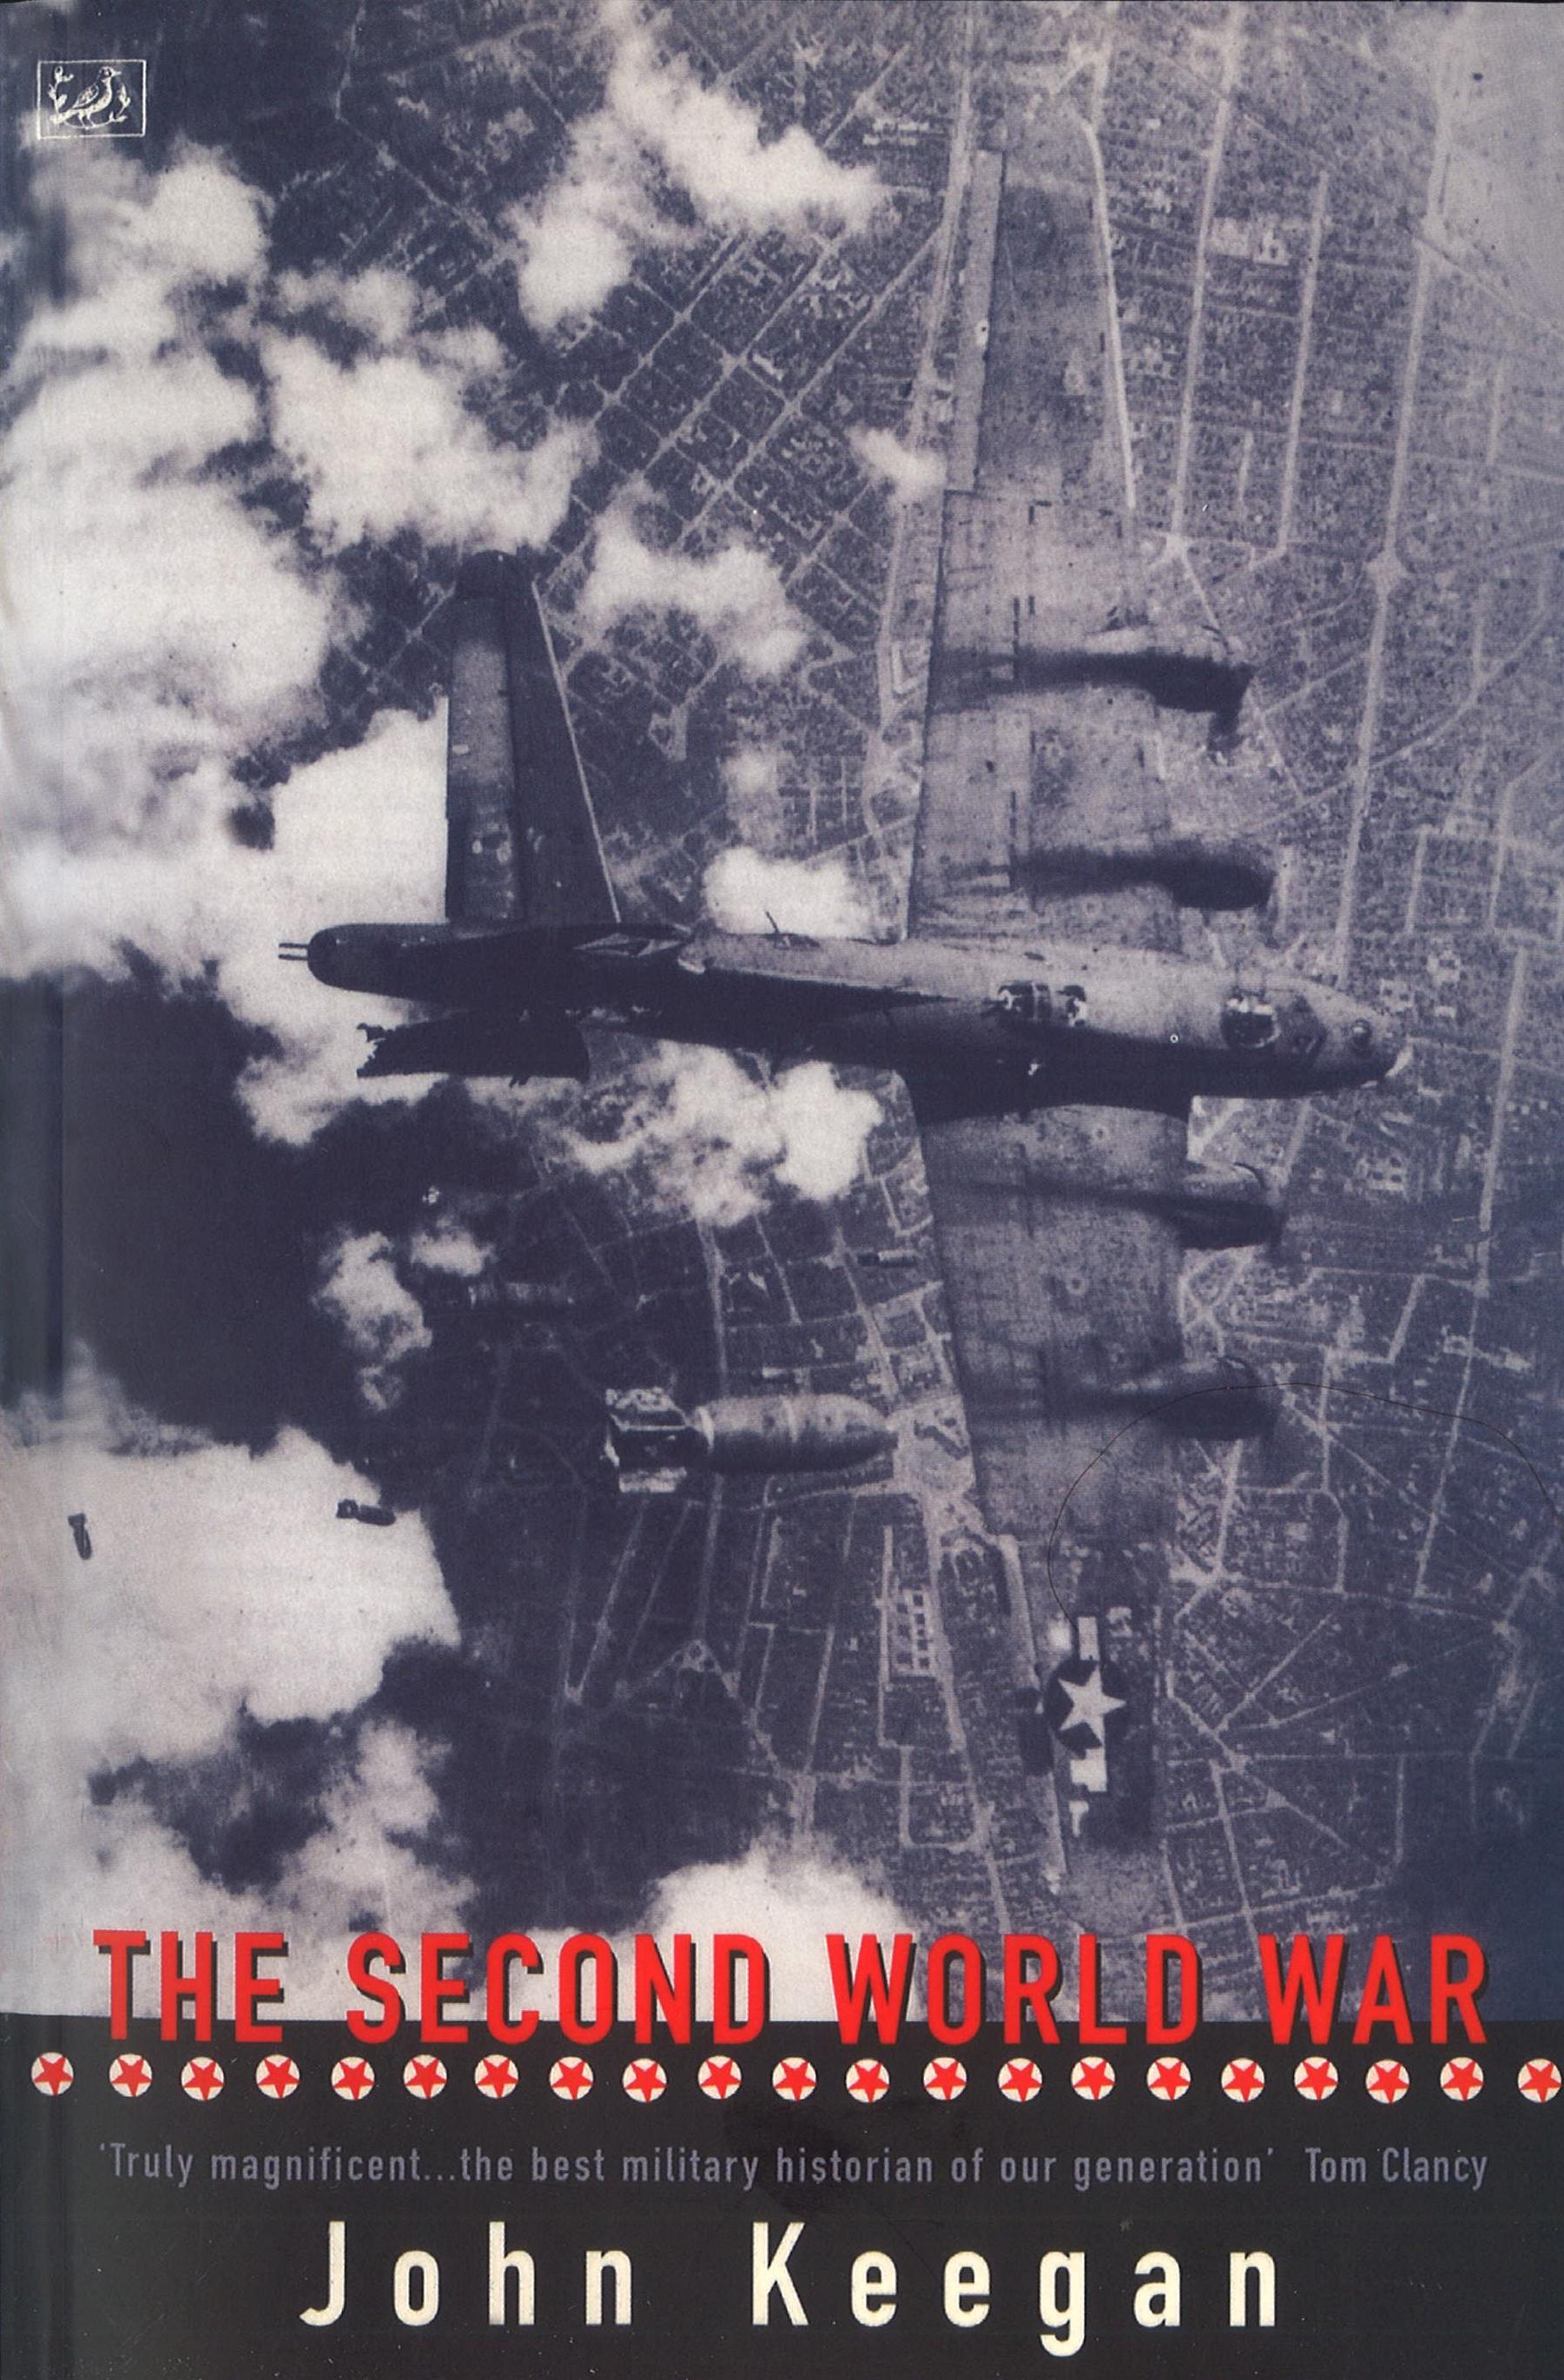 The Second World War by John Keegan - Penguin Books Australia